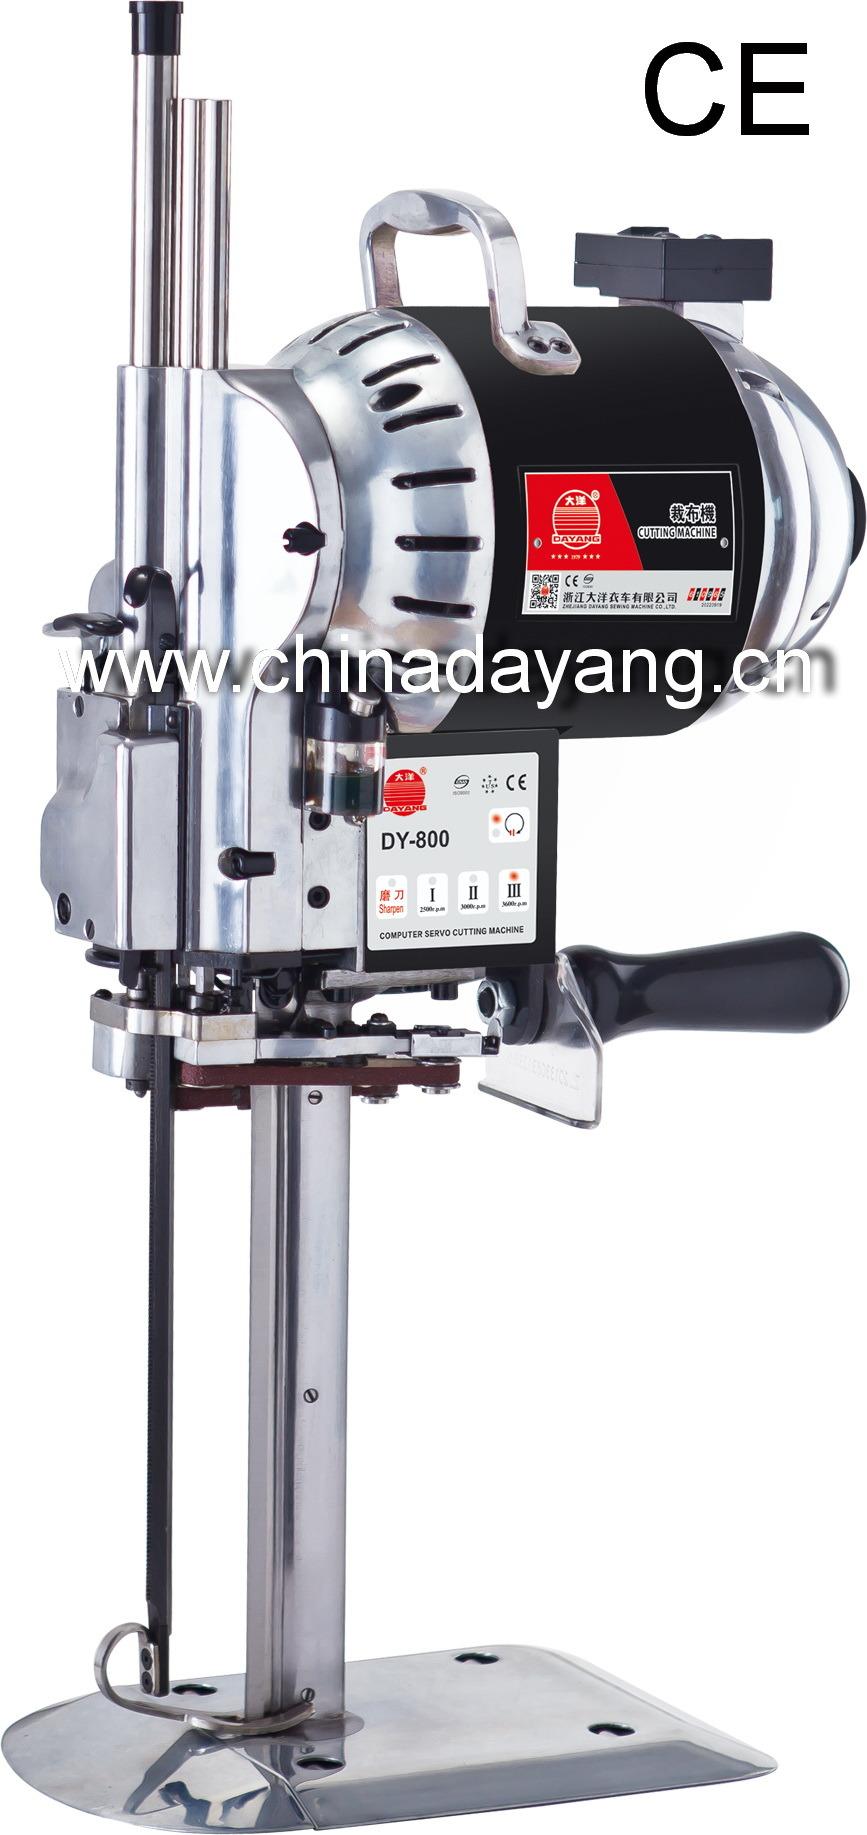 Three-Speed Computer Servo Fabric Cutting Machine Without Screen/Cloth Cutter/Cutter Machine/Industrial Sewing Machine (DY-6800)